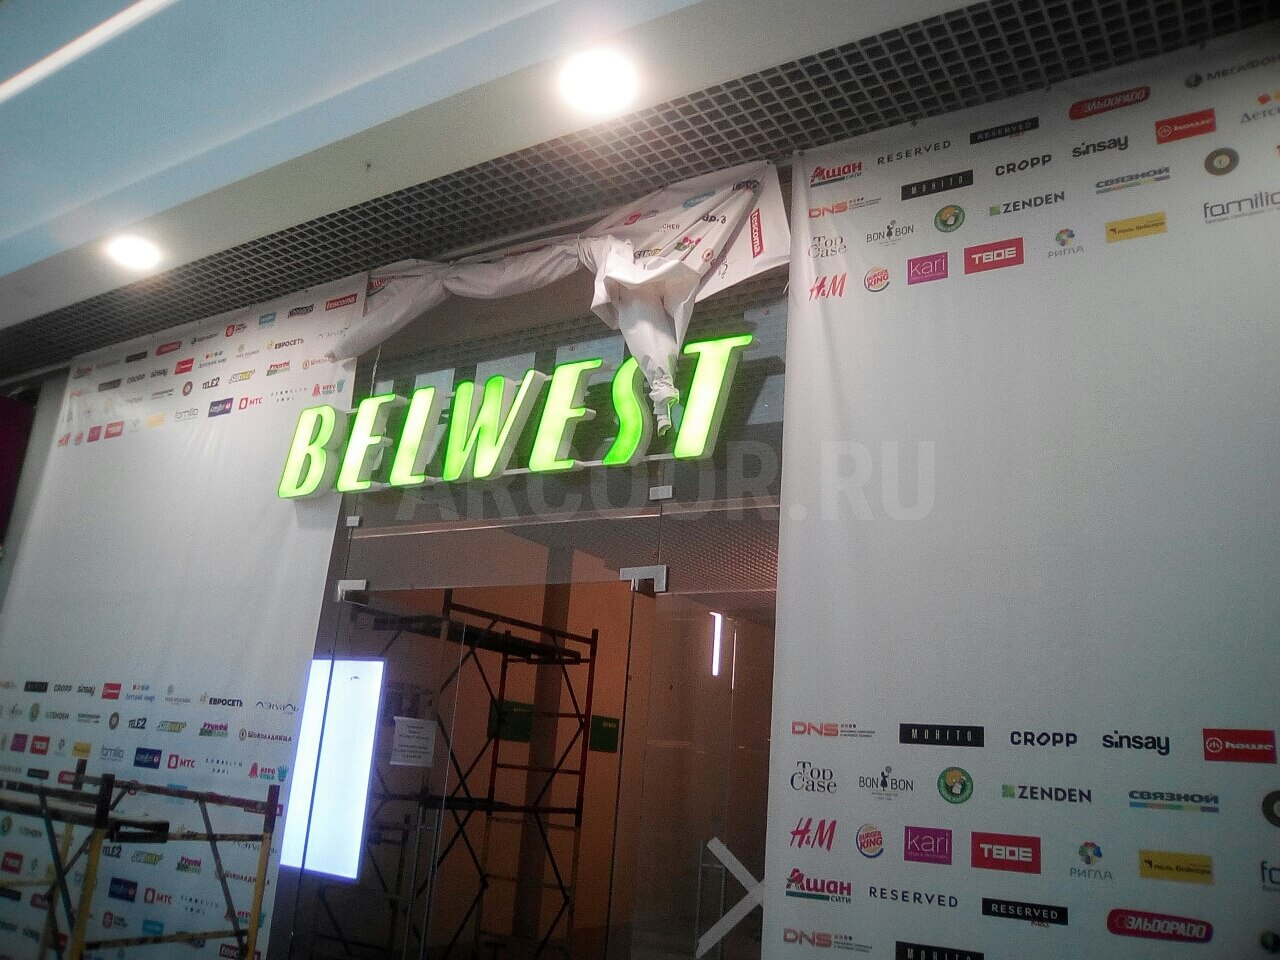 Объемные световые буквы на металлокаркасе BELWEST